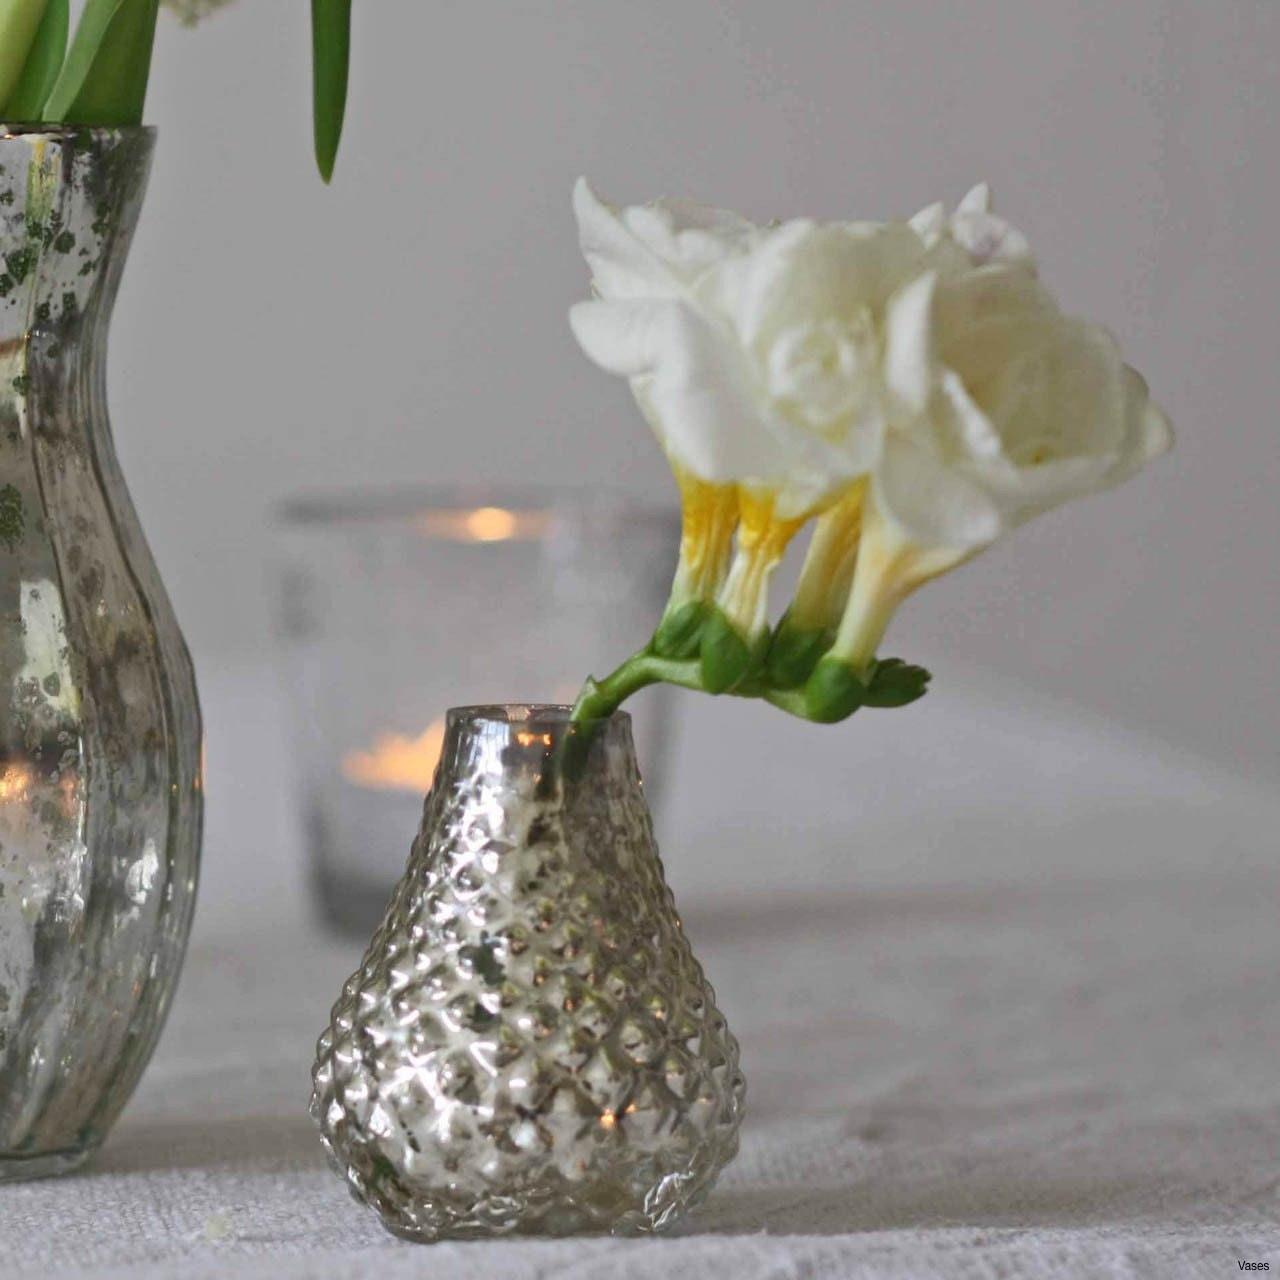 mason jar vases for wedding of decorative jars and vases gallery jar flower 1h vases bud wedding for decorative jars and vases gallery jar flower 1h vases bud wedding vase centerpiece idea i 0d design